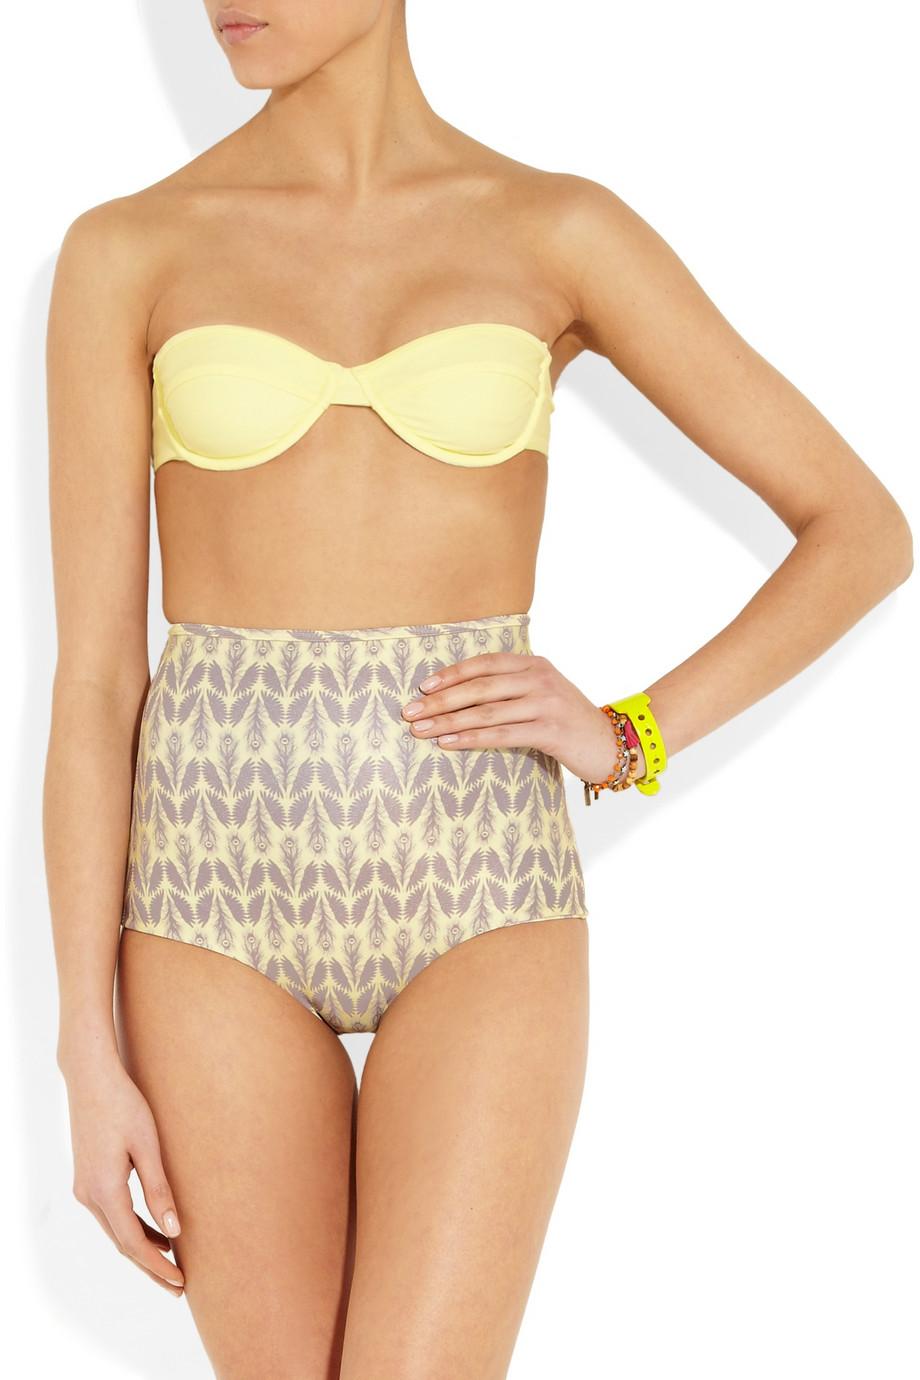 $52 swimwear available on cherae.com